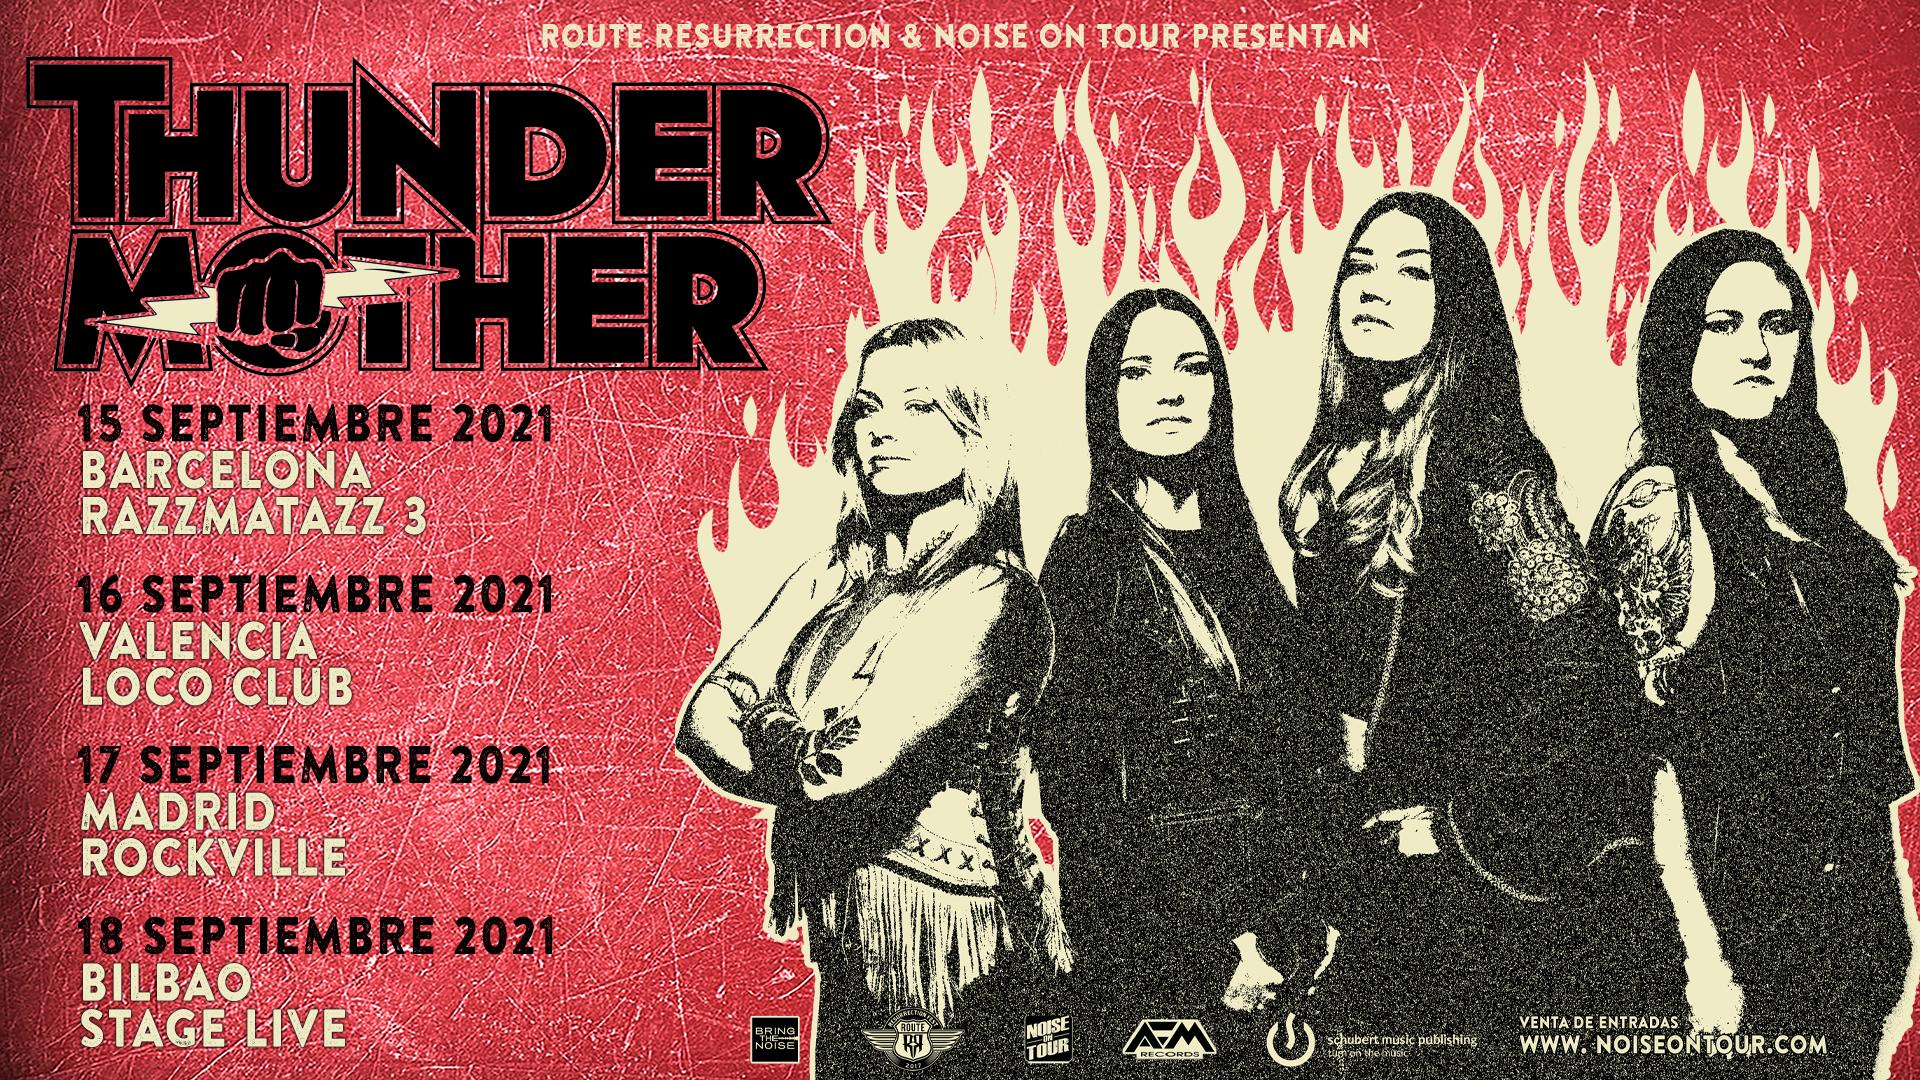 Route Resurrection Fest 2021 - Thundermother - Event